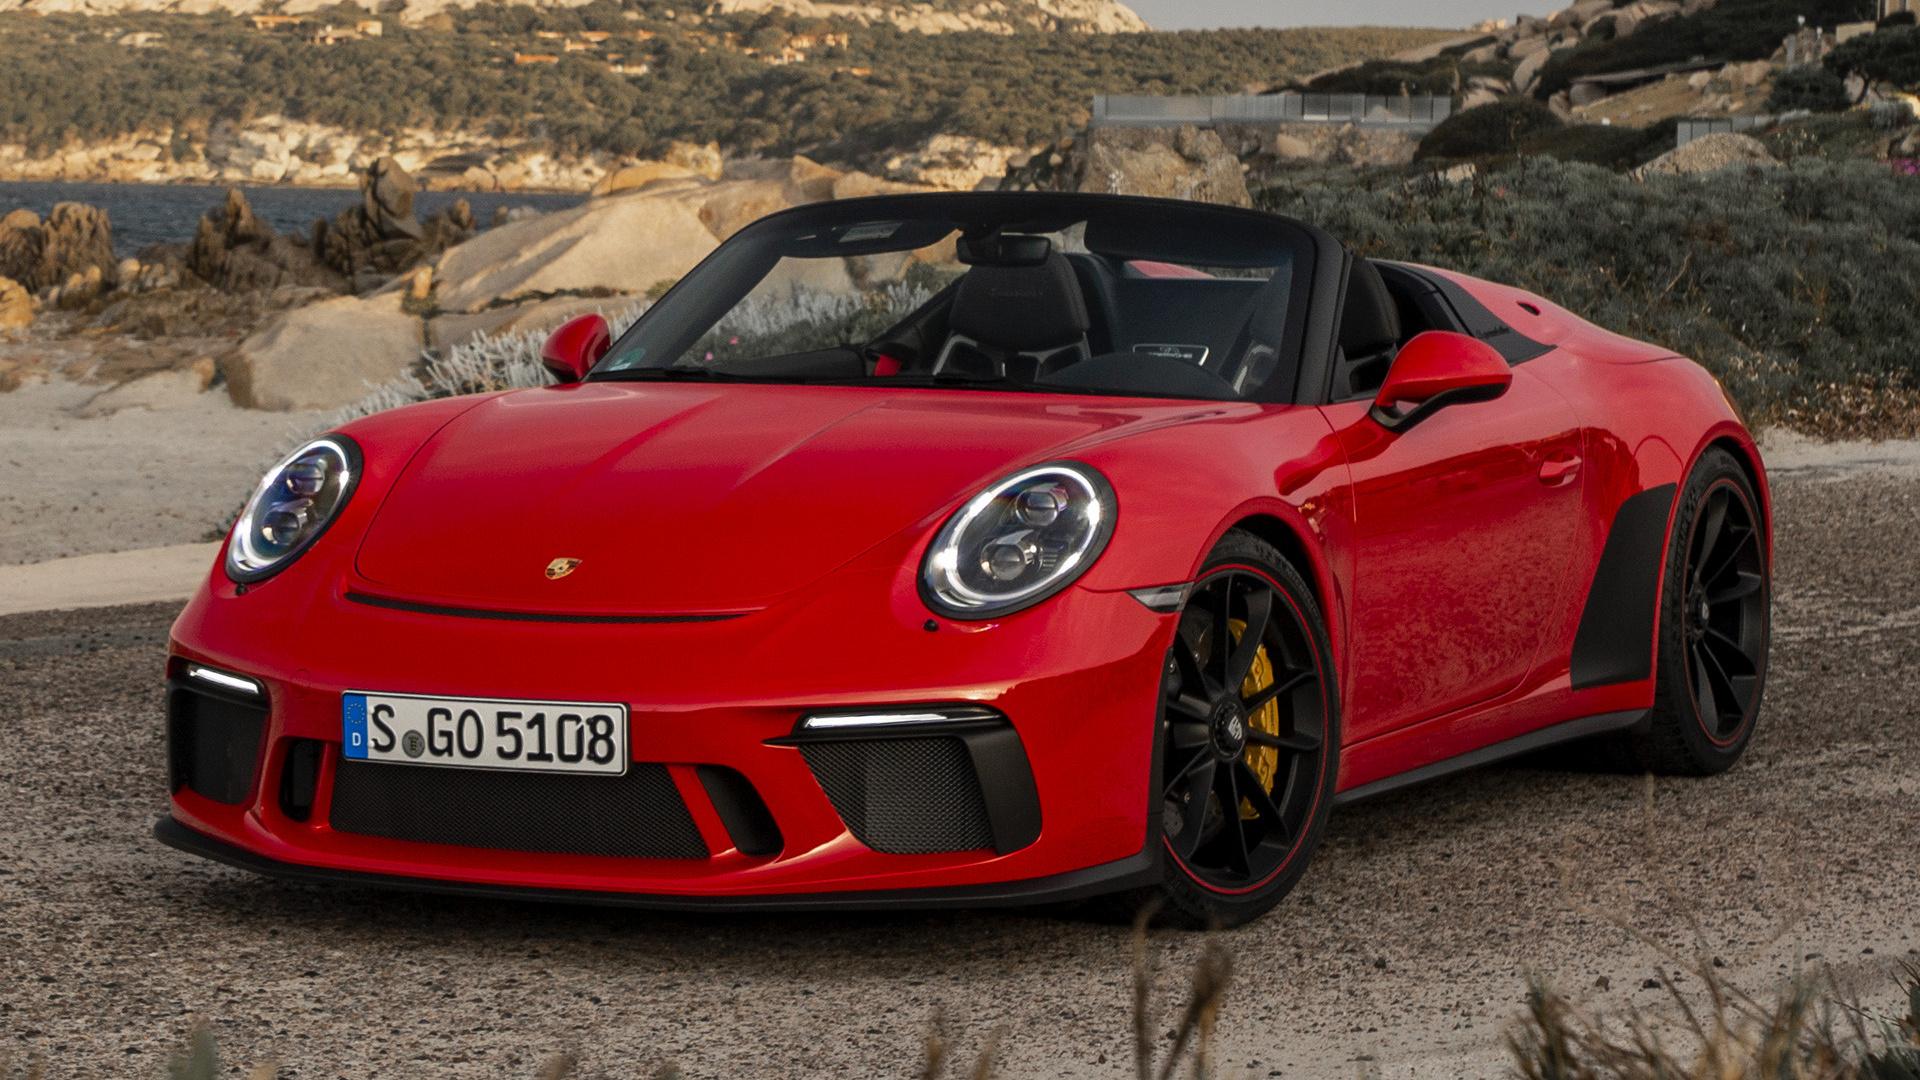 2019 Porsche 911 Speedster - Wallpapers and HD Images ...